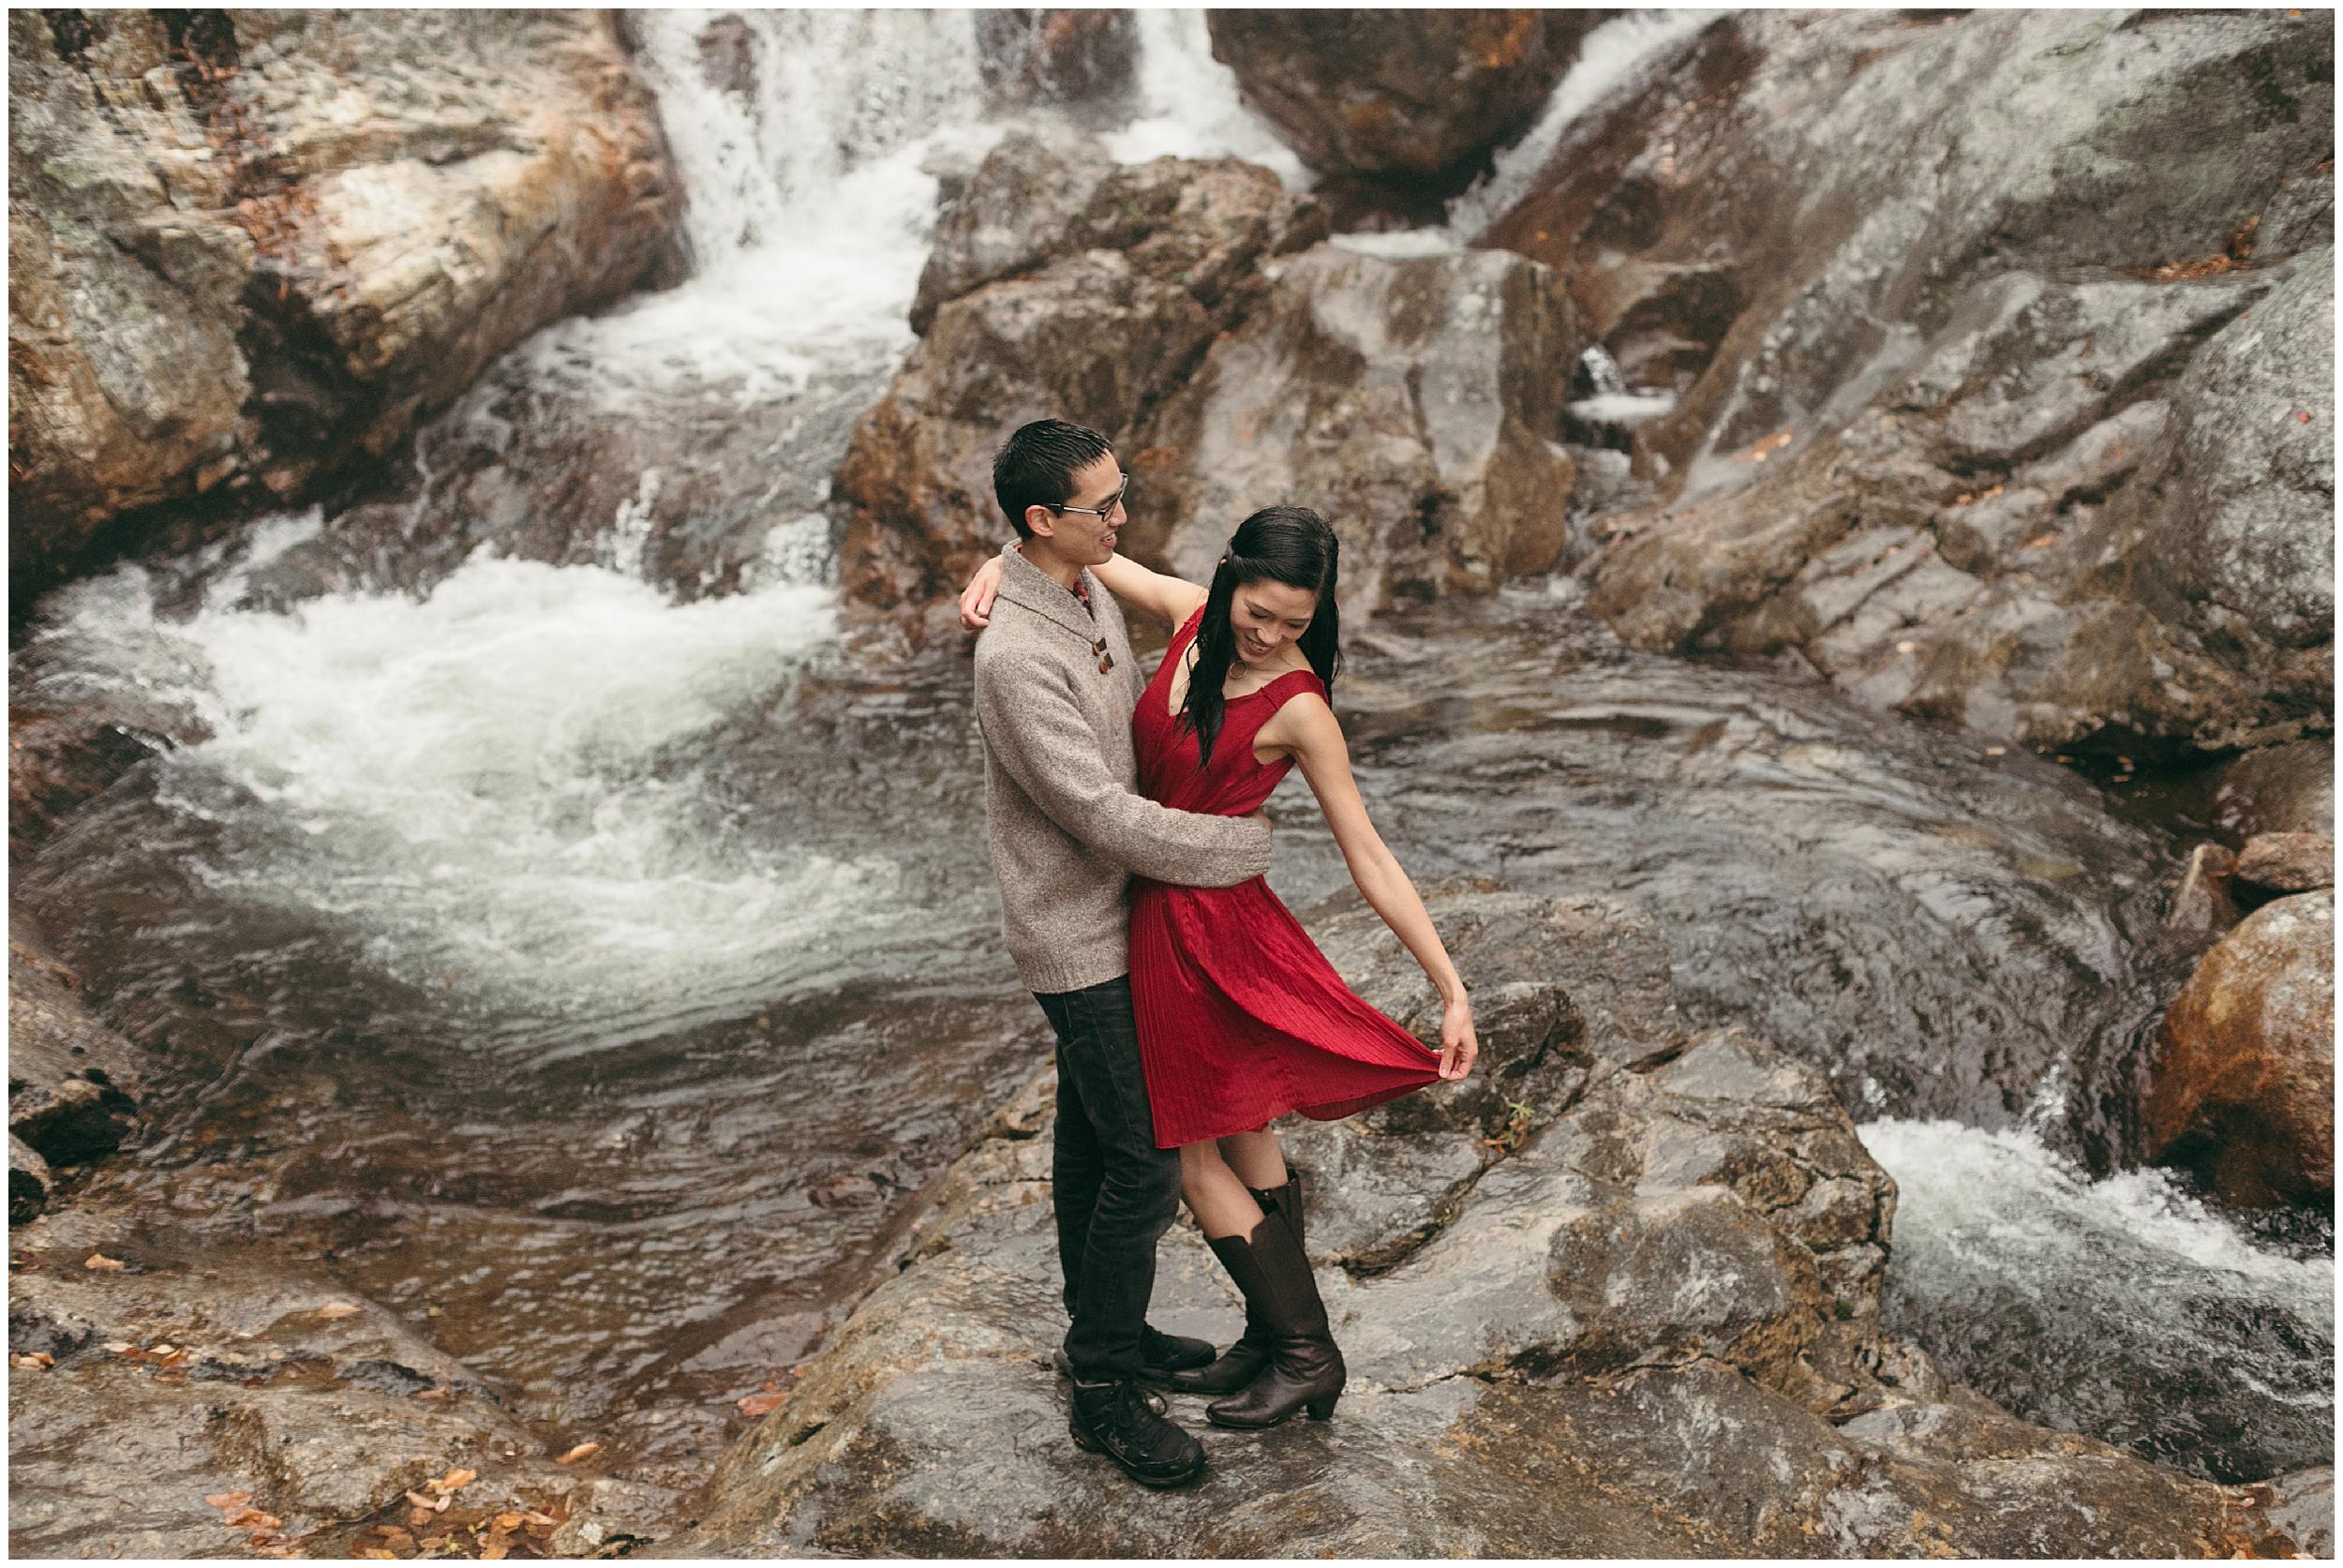 White-Mountains-Engagement-Bailey-Q-Photo-New-Hampshire-Wedding-Photographer-14.jpg